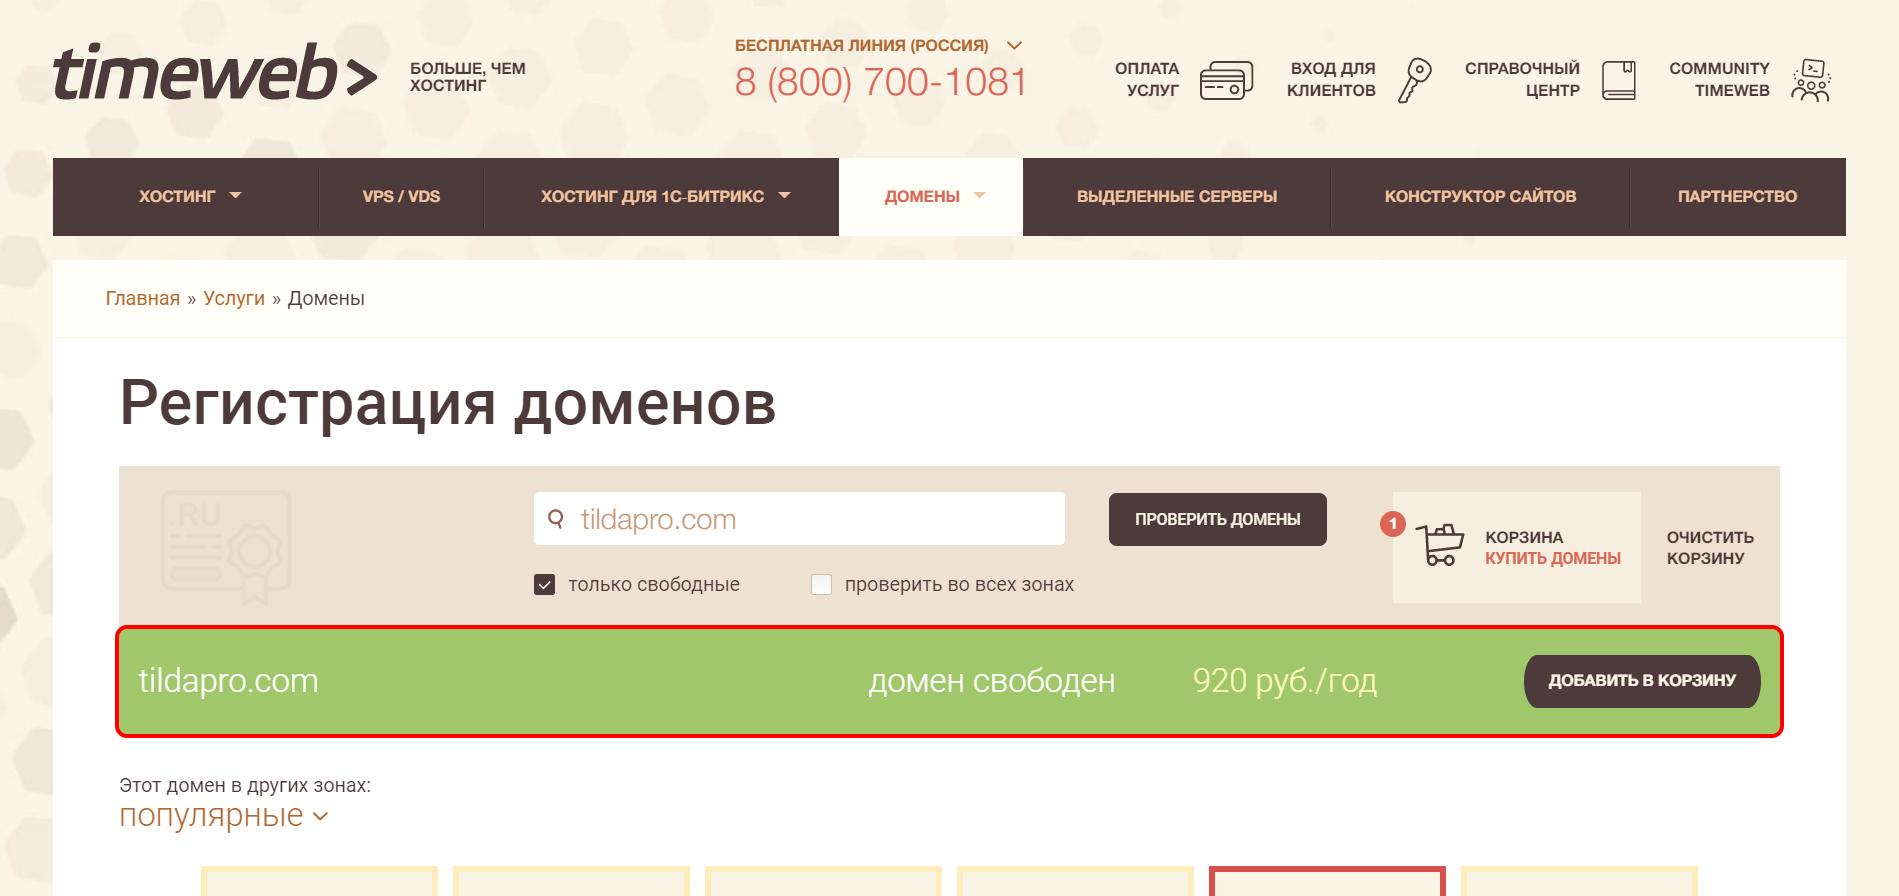 Как купить домен на Timeweb